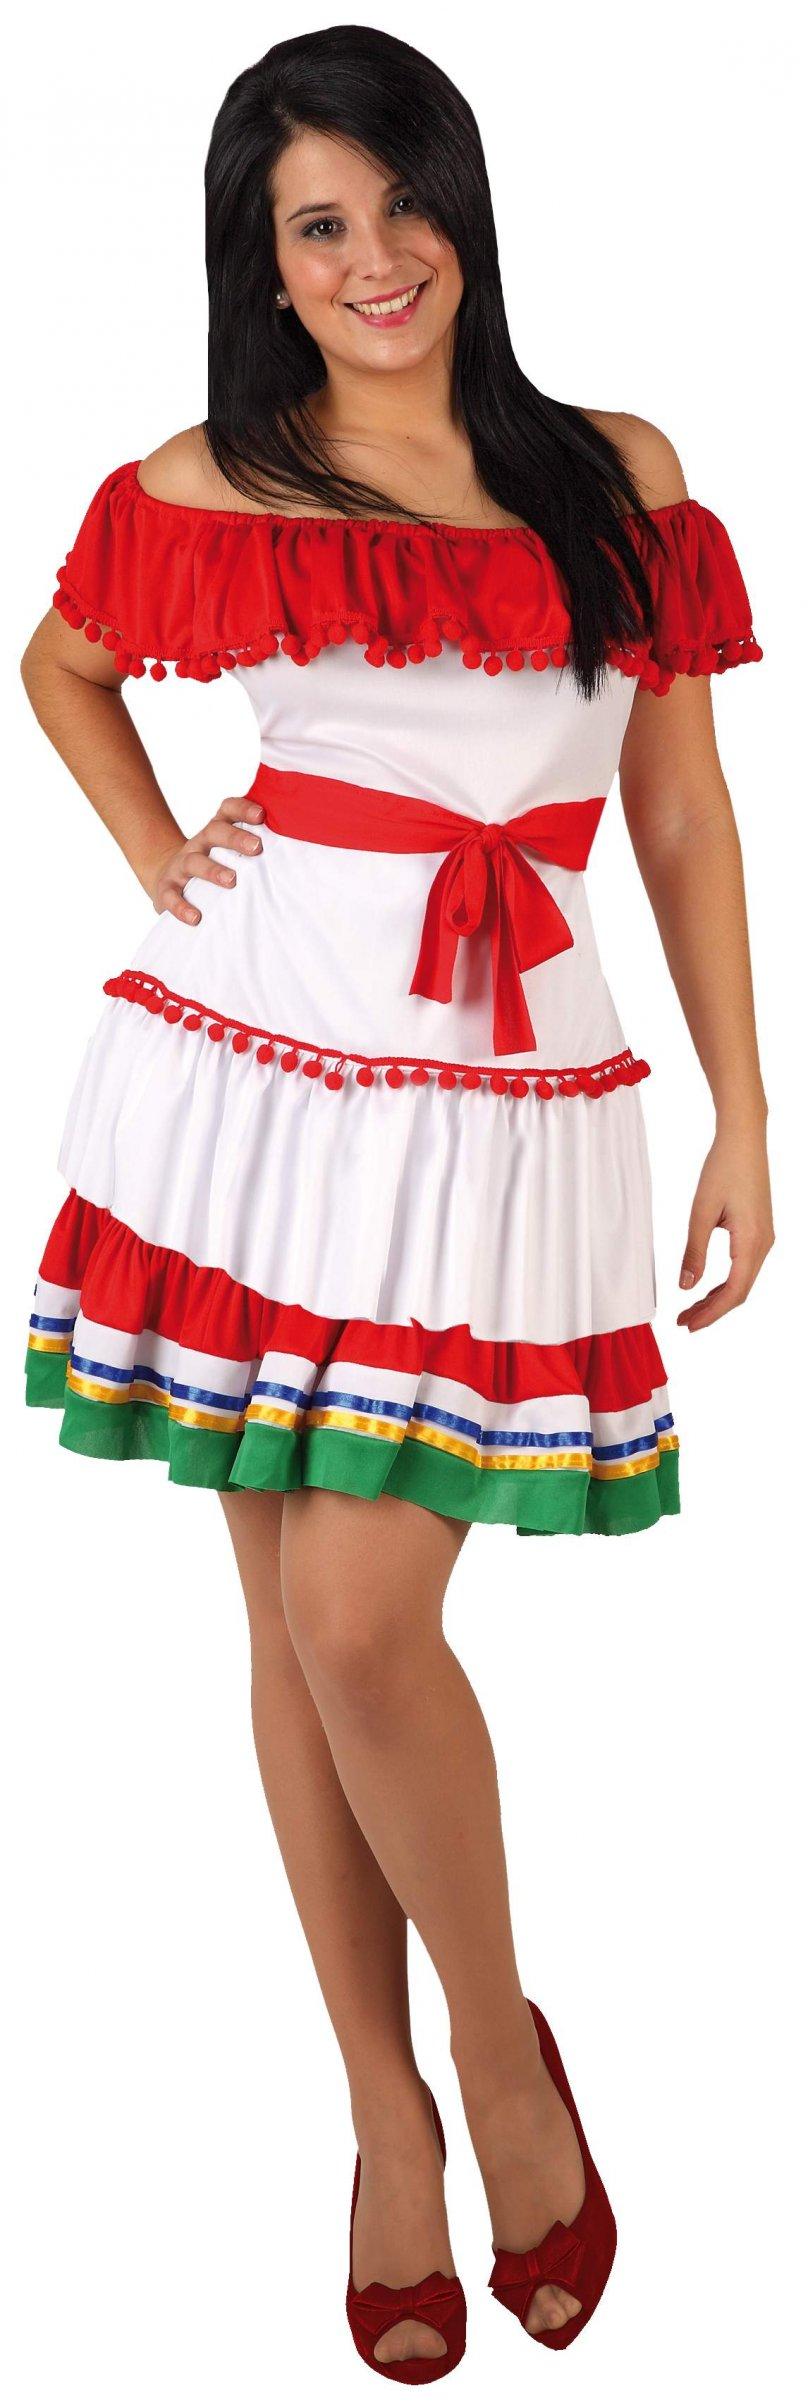 deguisement mexicaine